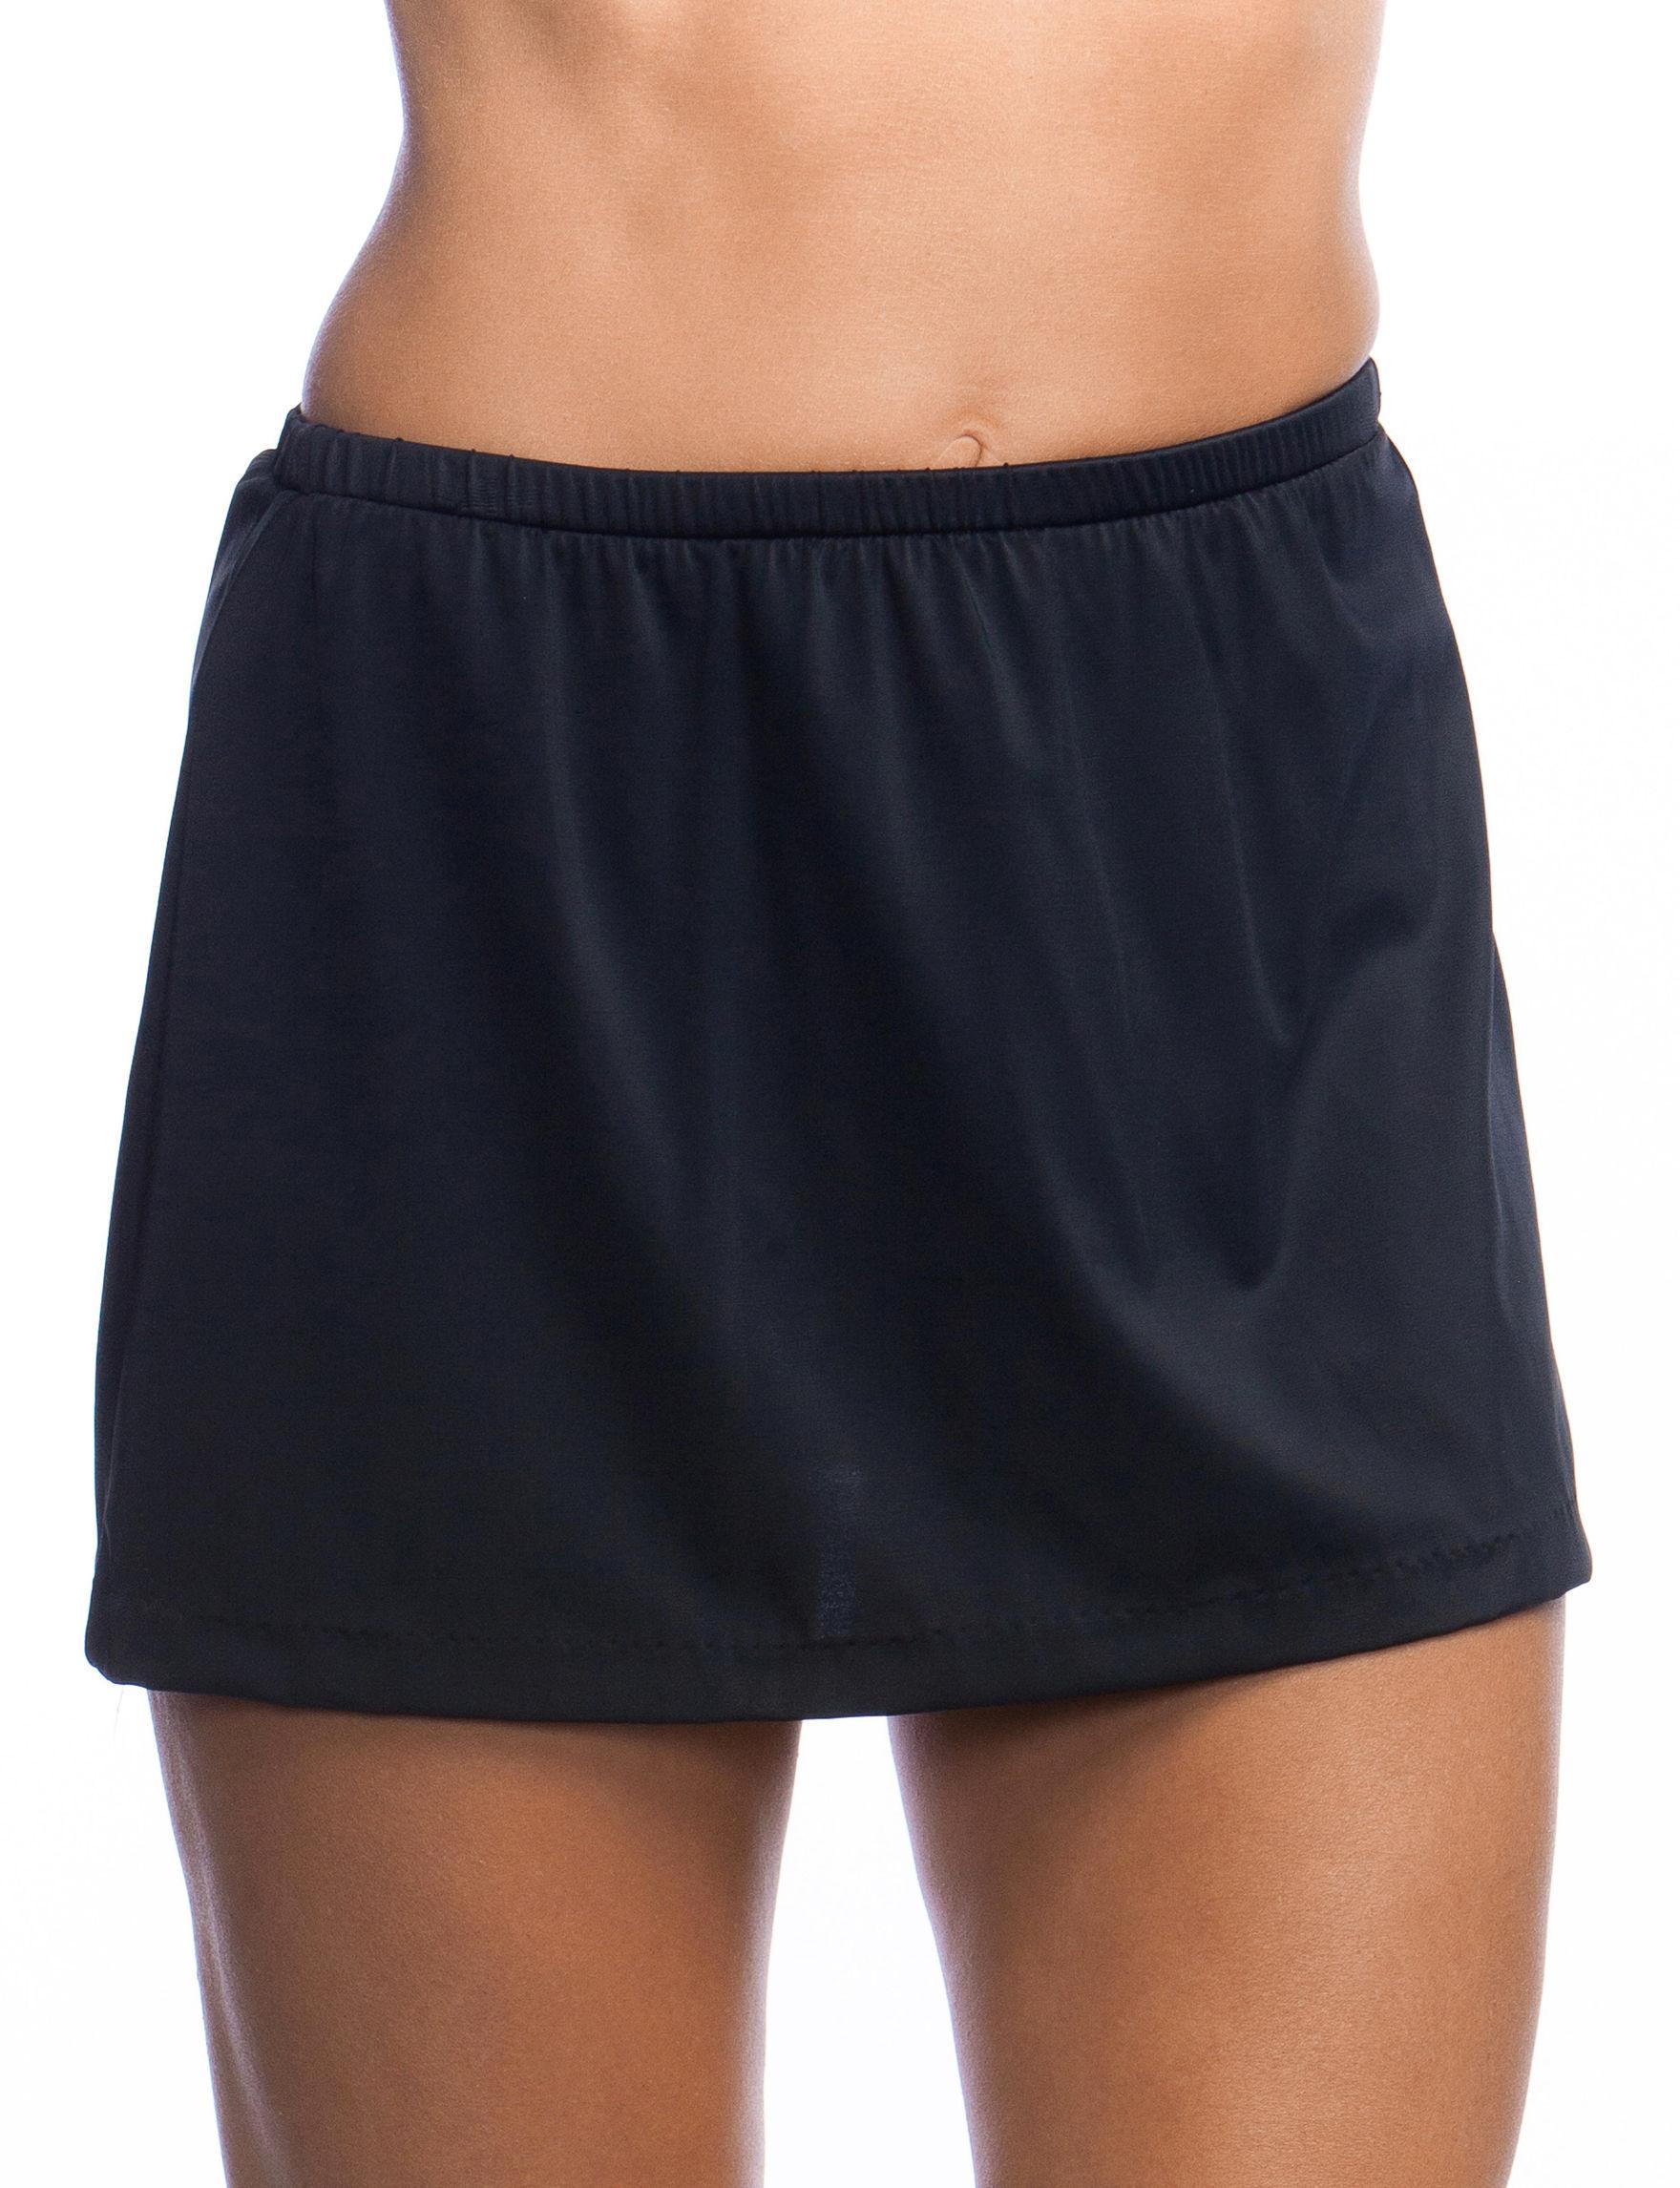 Maxine of Hollywood Black Swimsuit Bottoms Skirtini